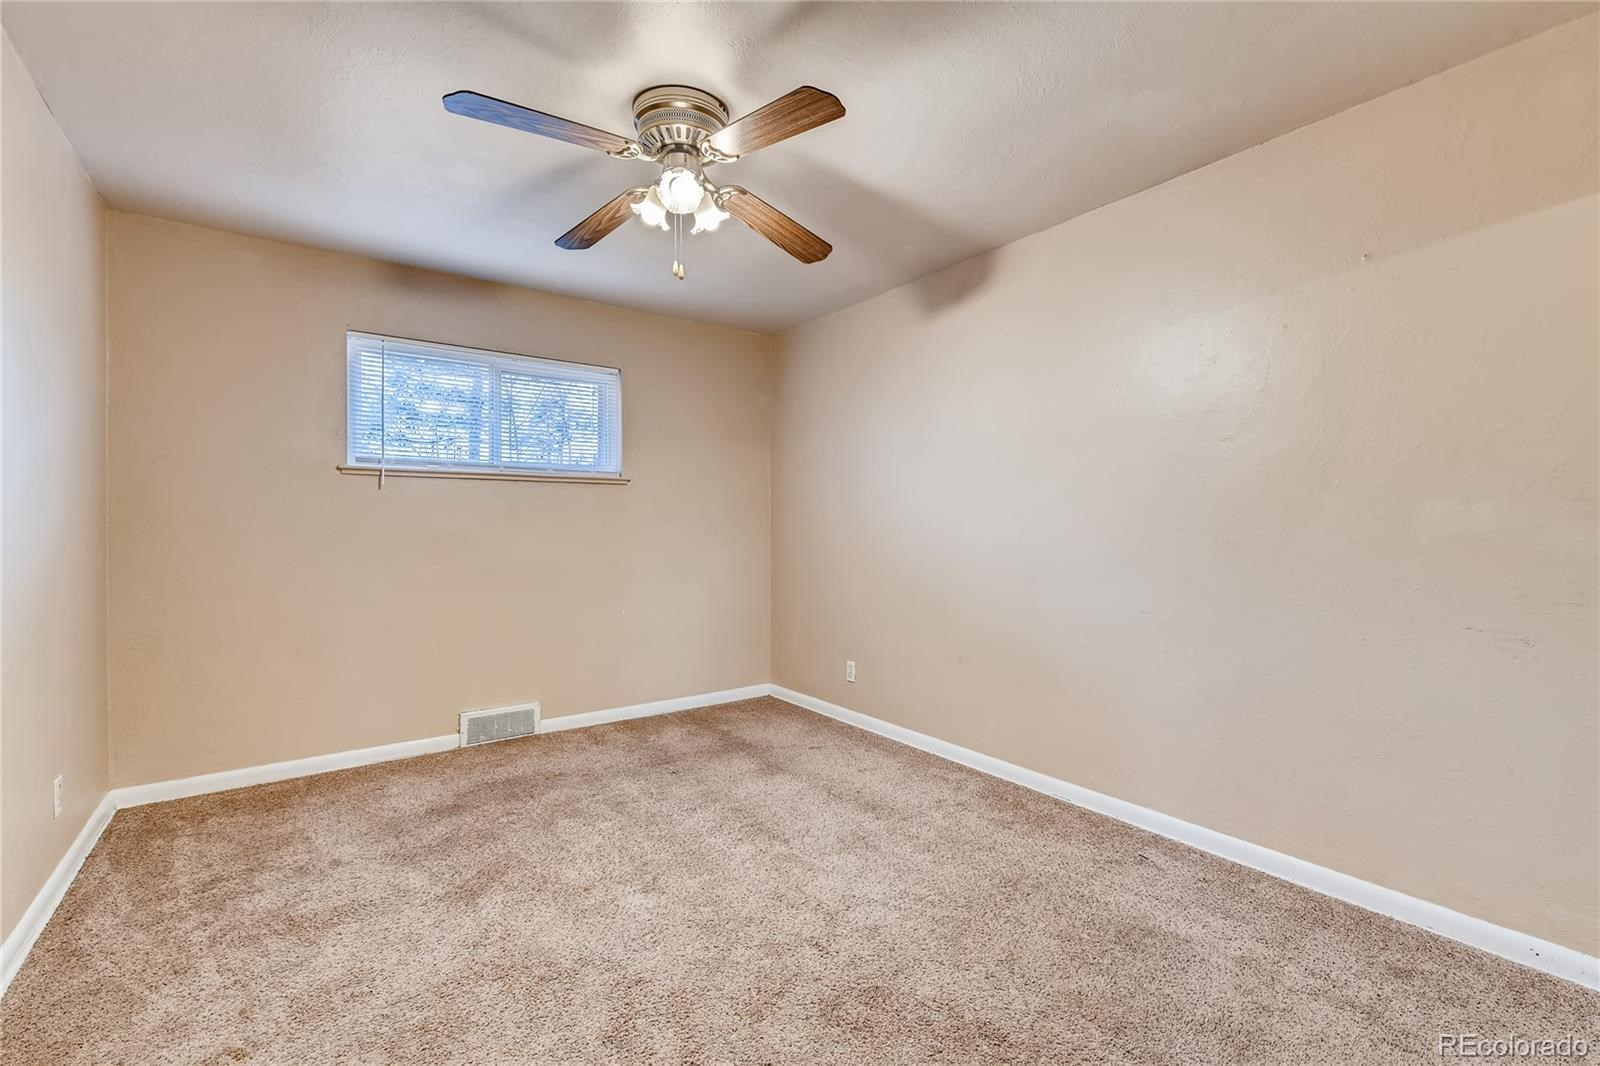 MLS# 2644155 - 10 - 3840 Ingalls Street, Wheat Ridge, CO 80033